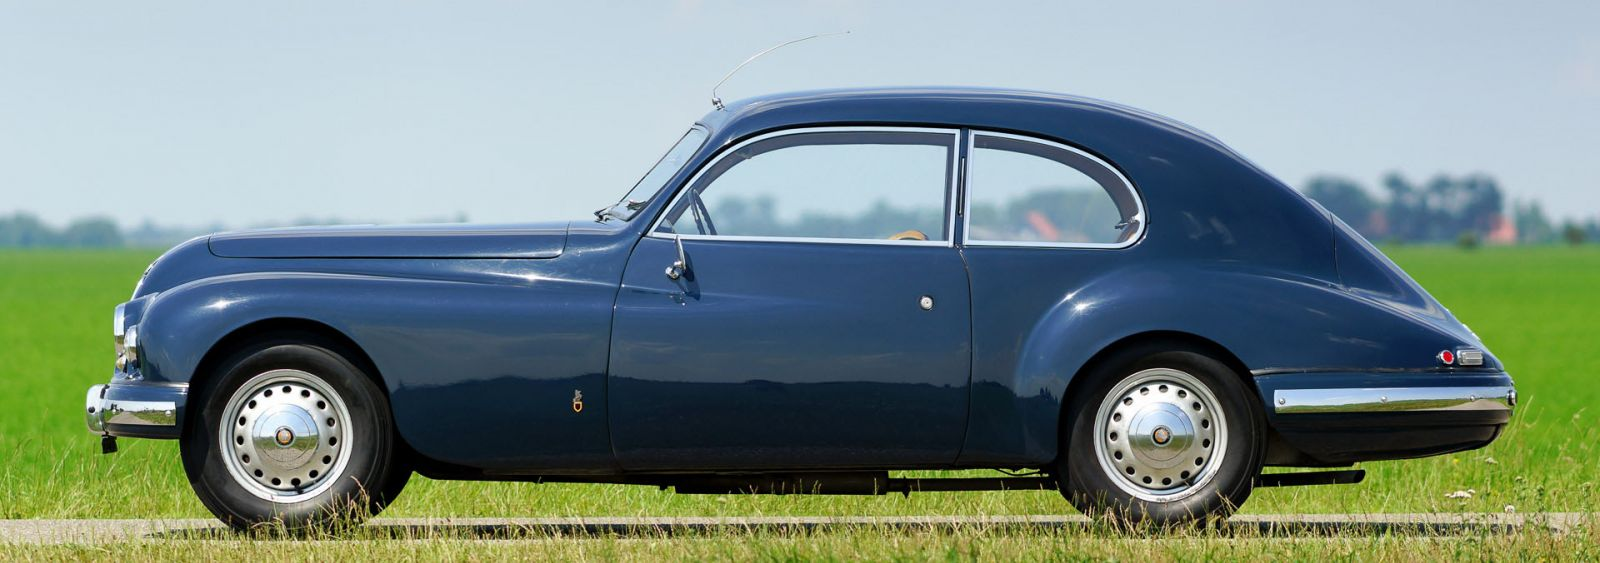 1953-bristol-401